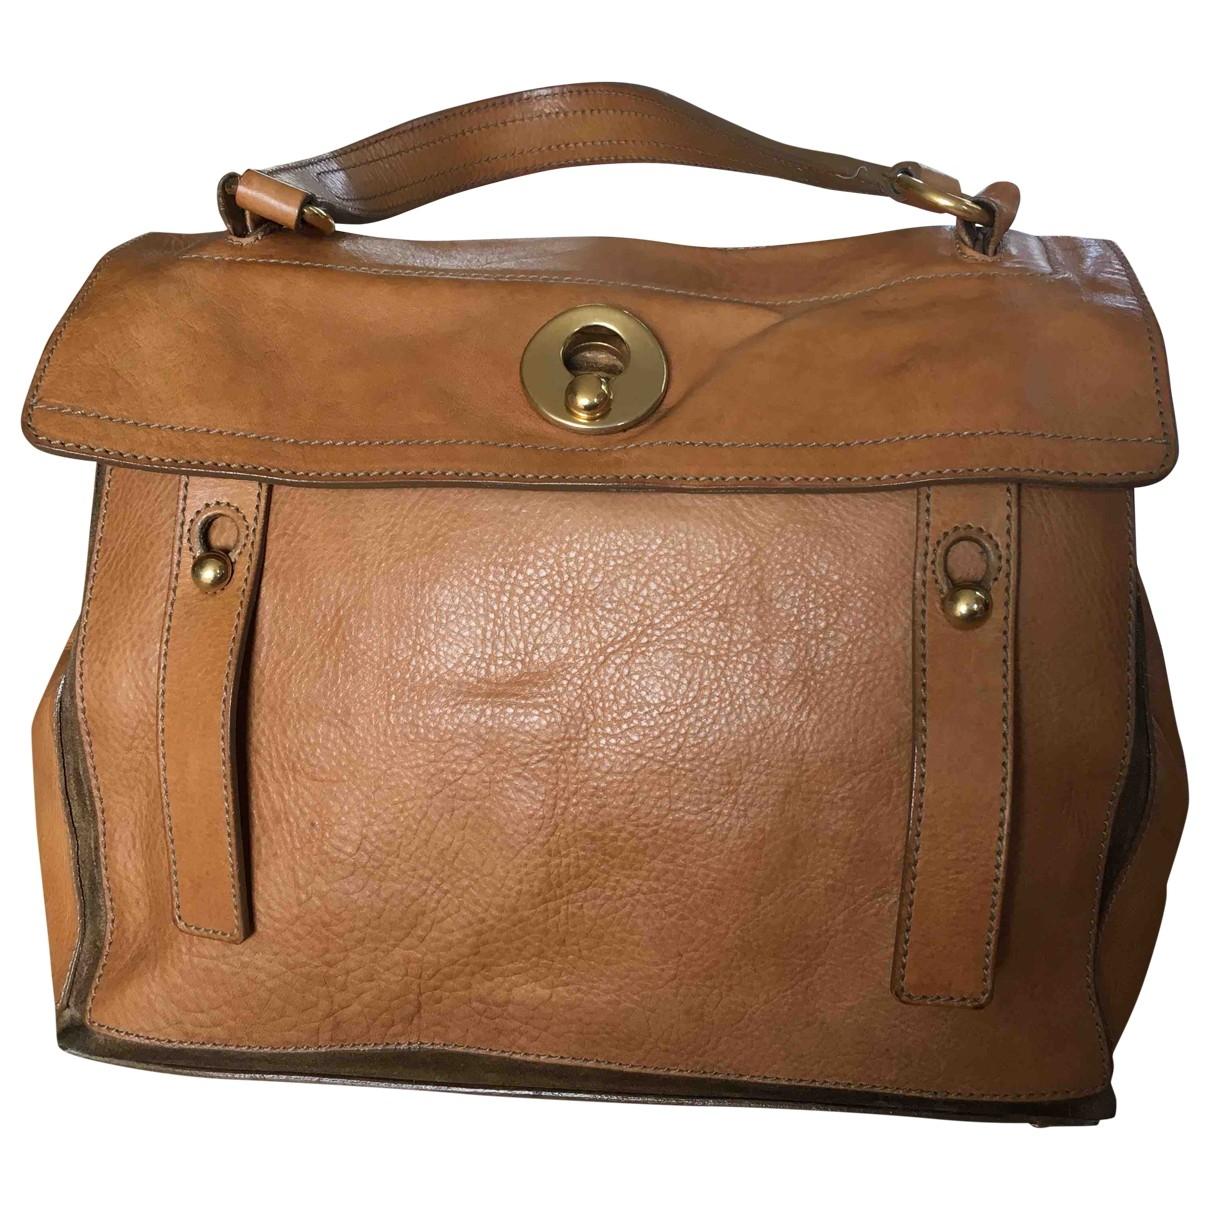 Yves Saint Laurent Muse Two Camel Leather handbag for Women \N